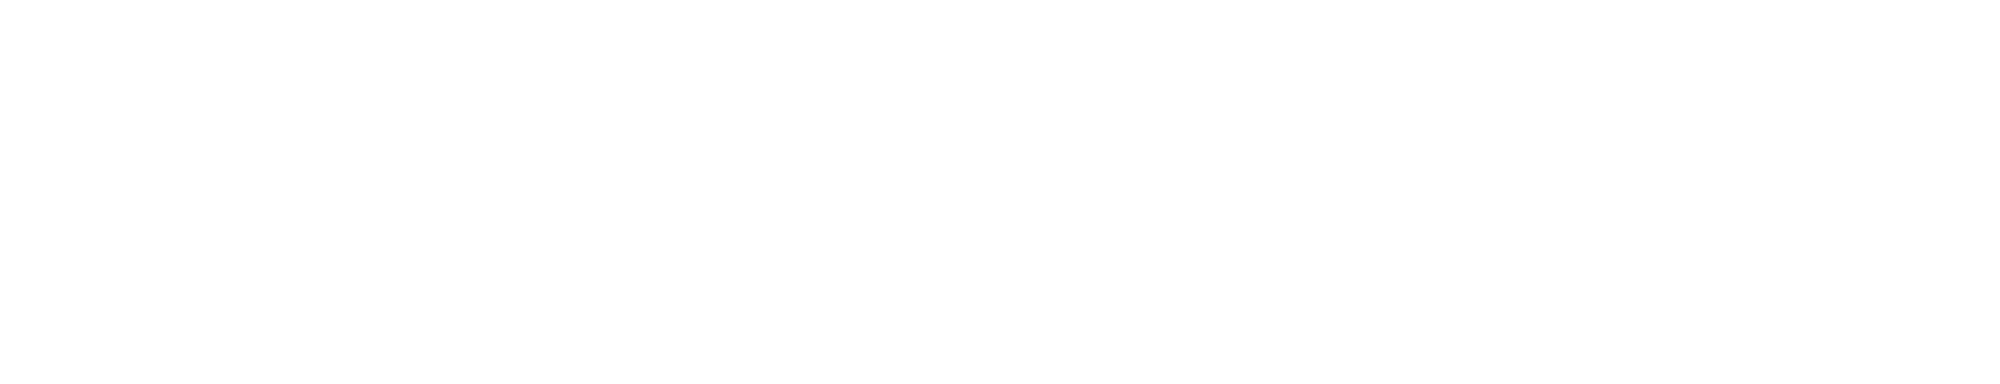 Db spacebanner